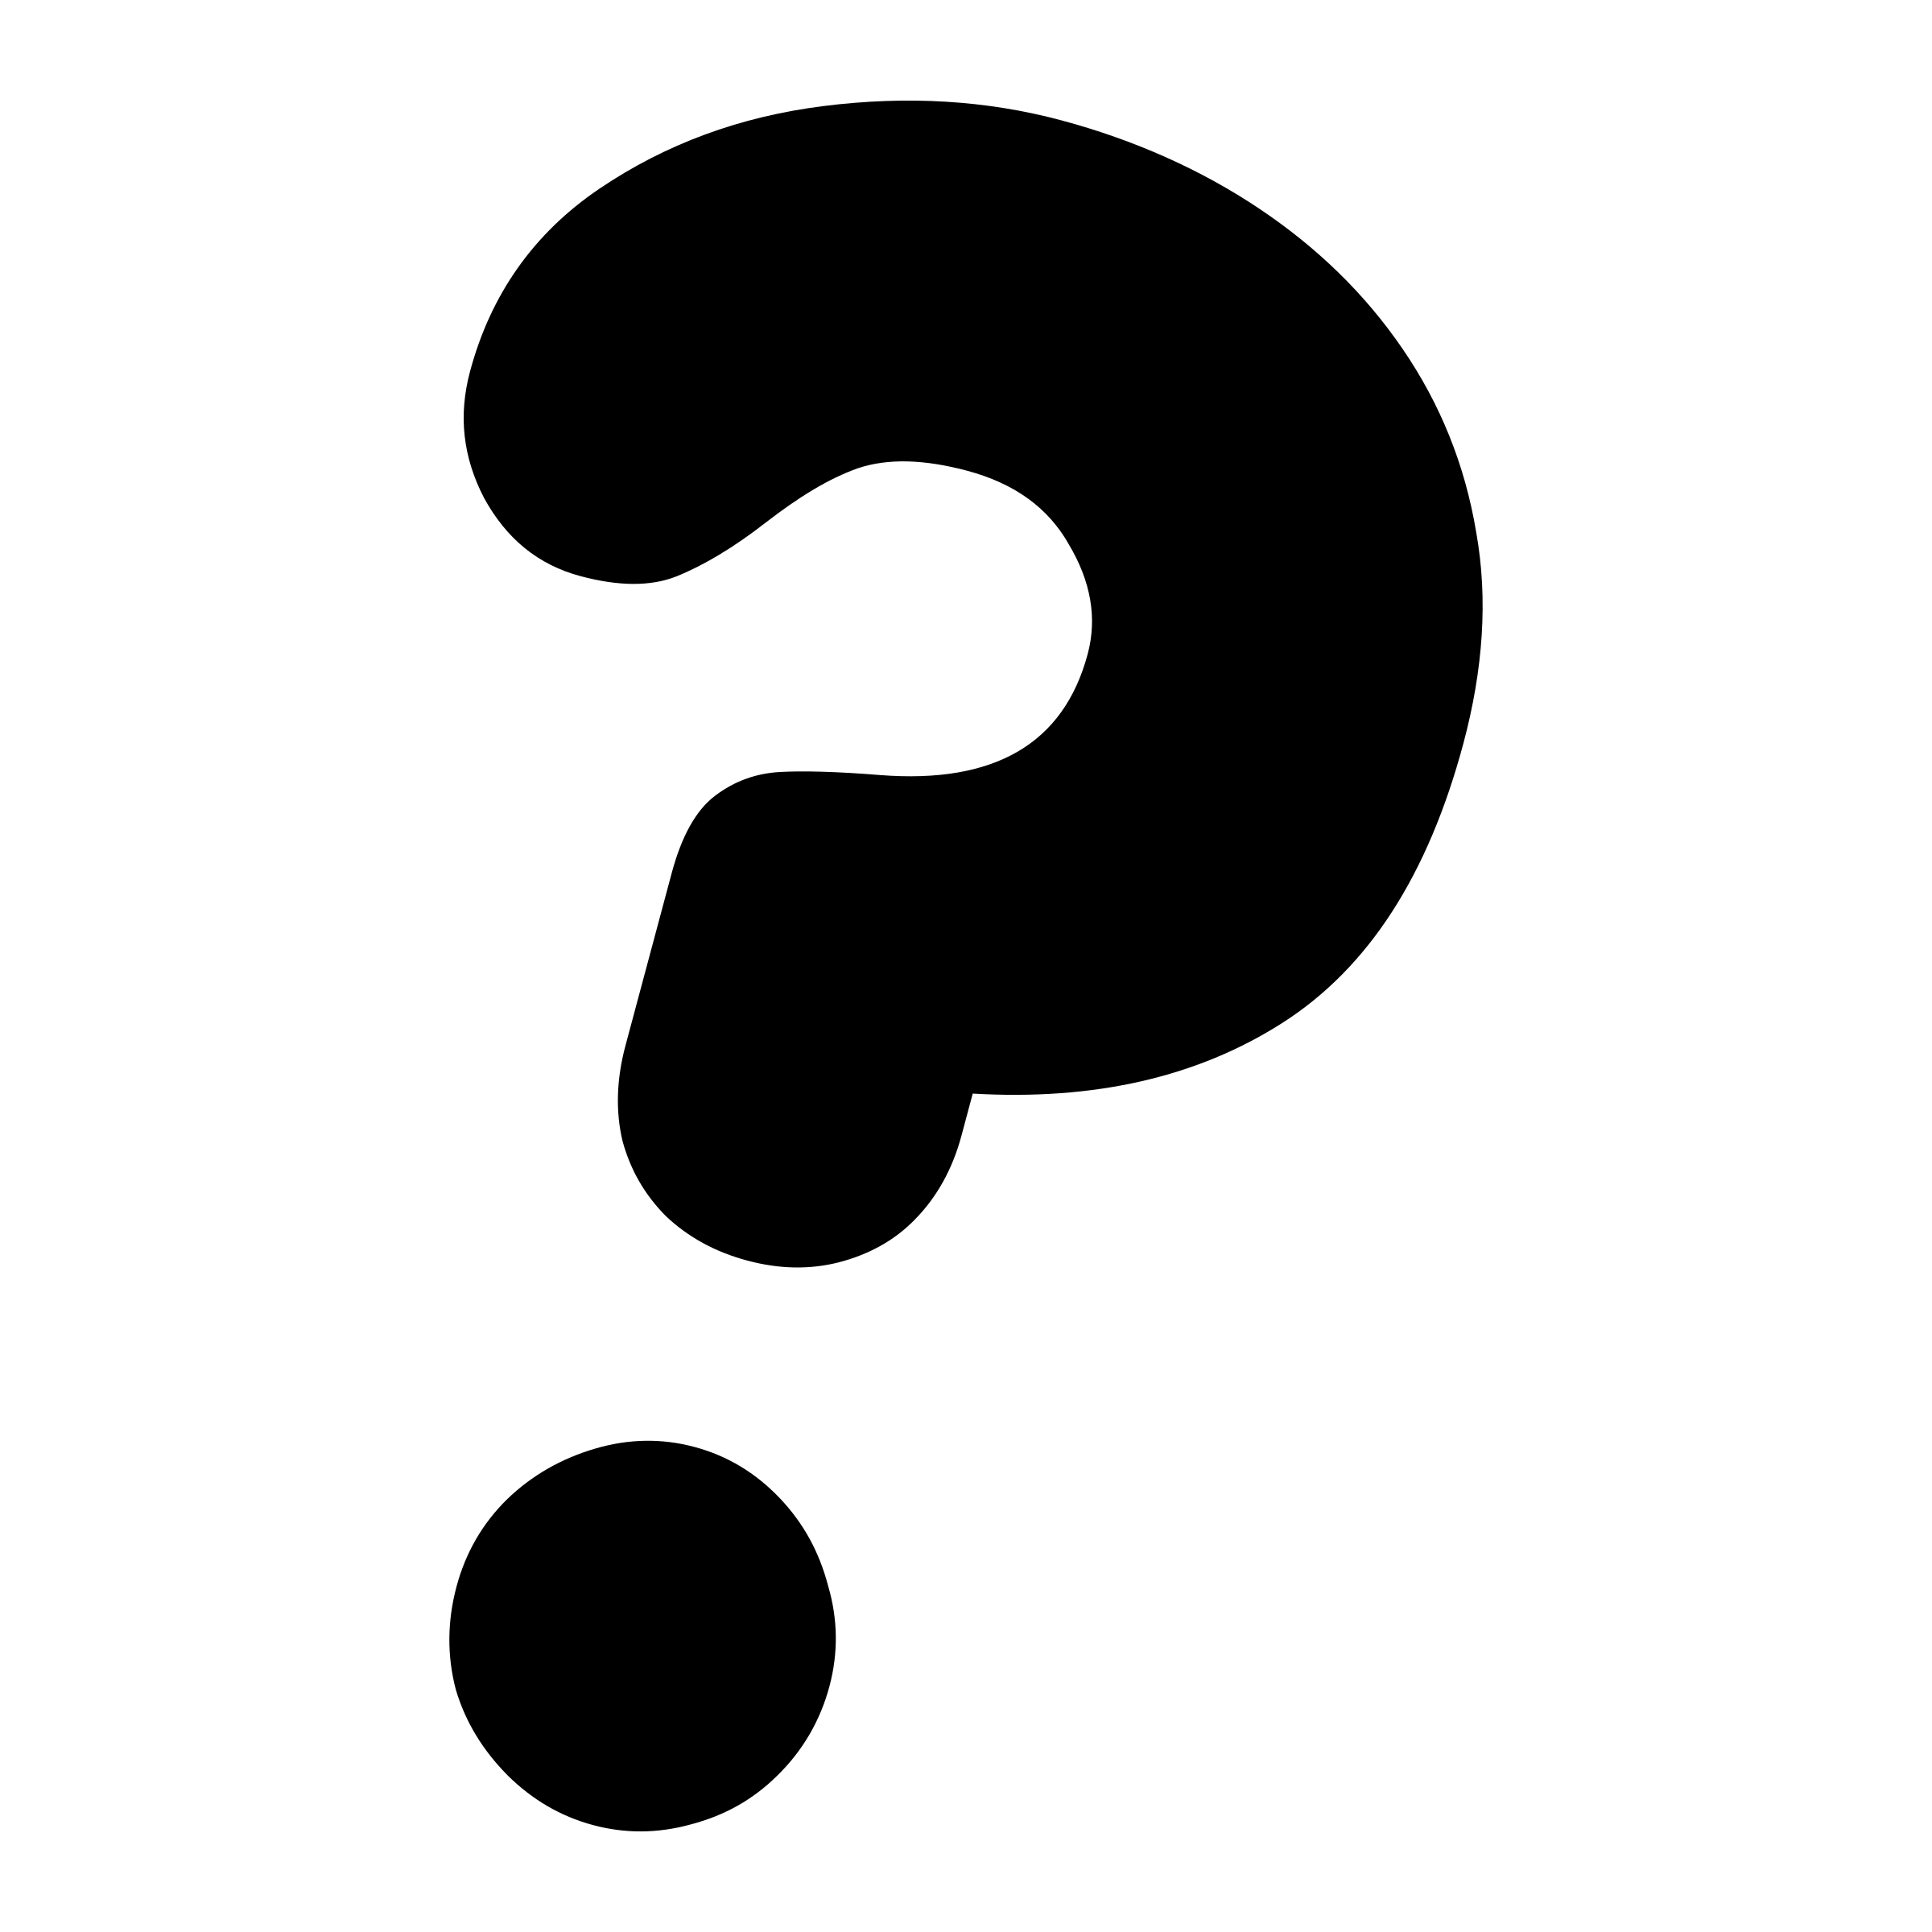 Questions question mark clip art microsoft for